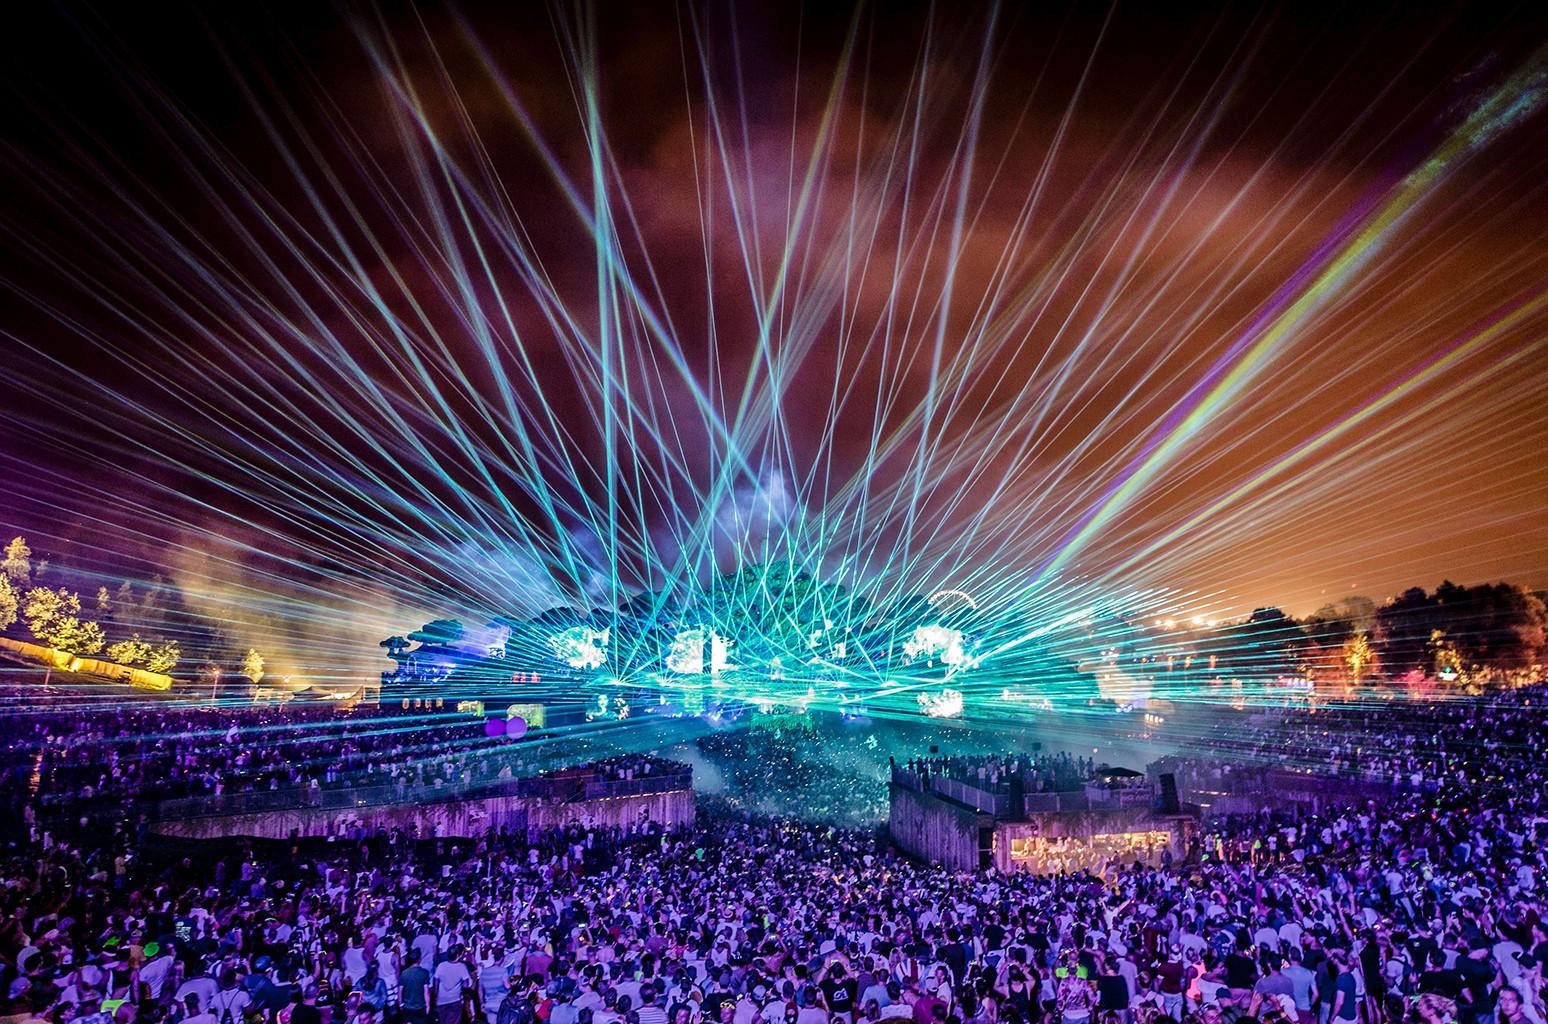 Tomorrowland Electronic Music Festival at the De Schorre recreation area in Boom, Belgium.